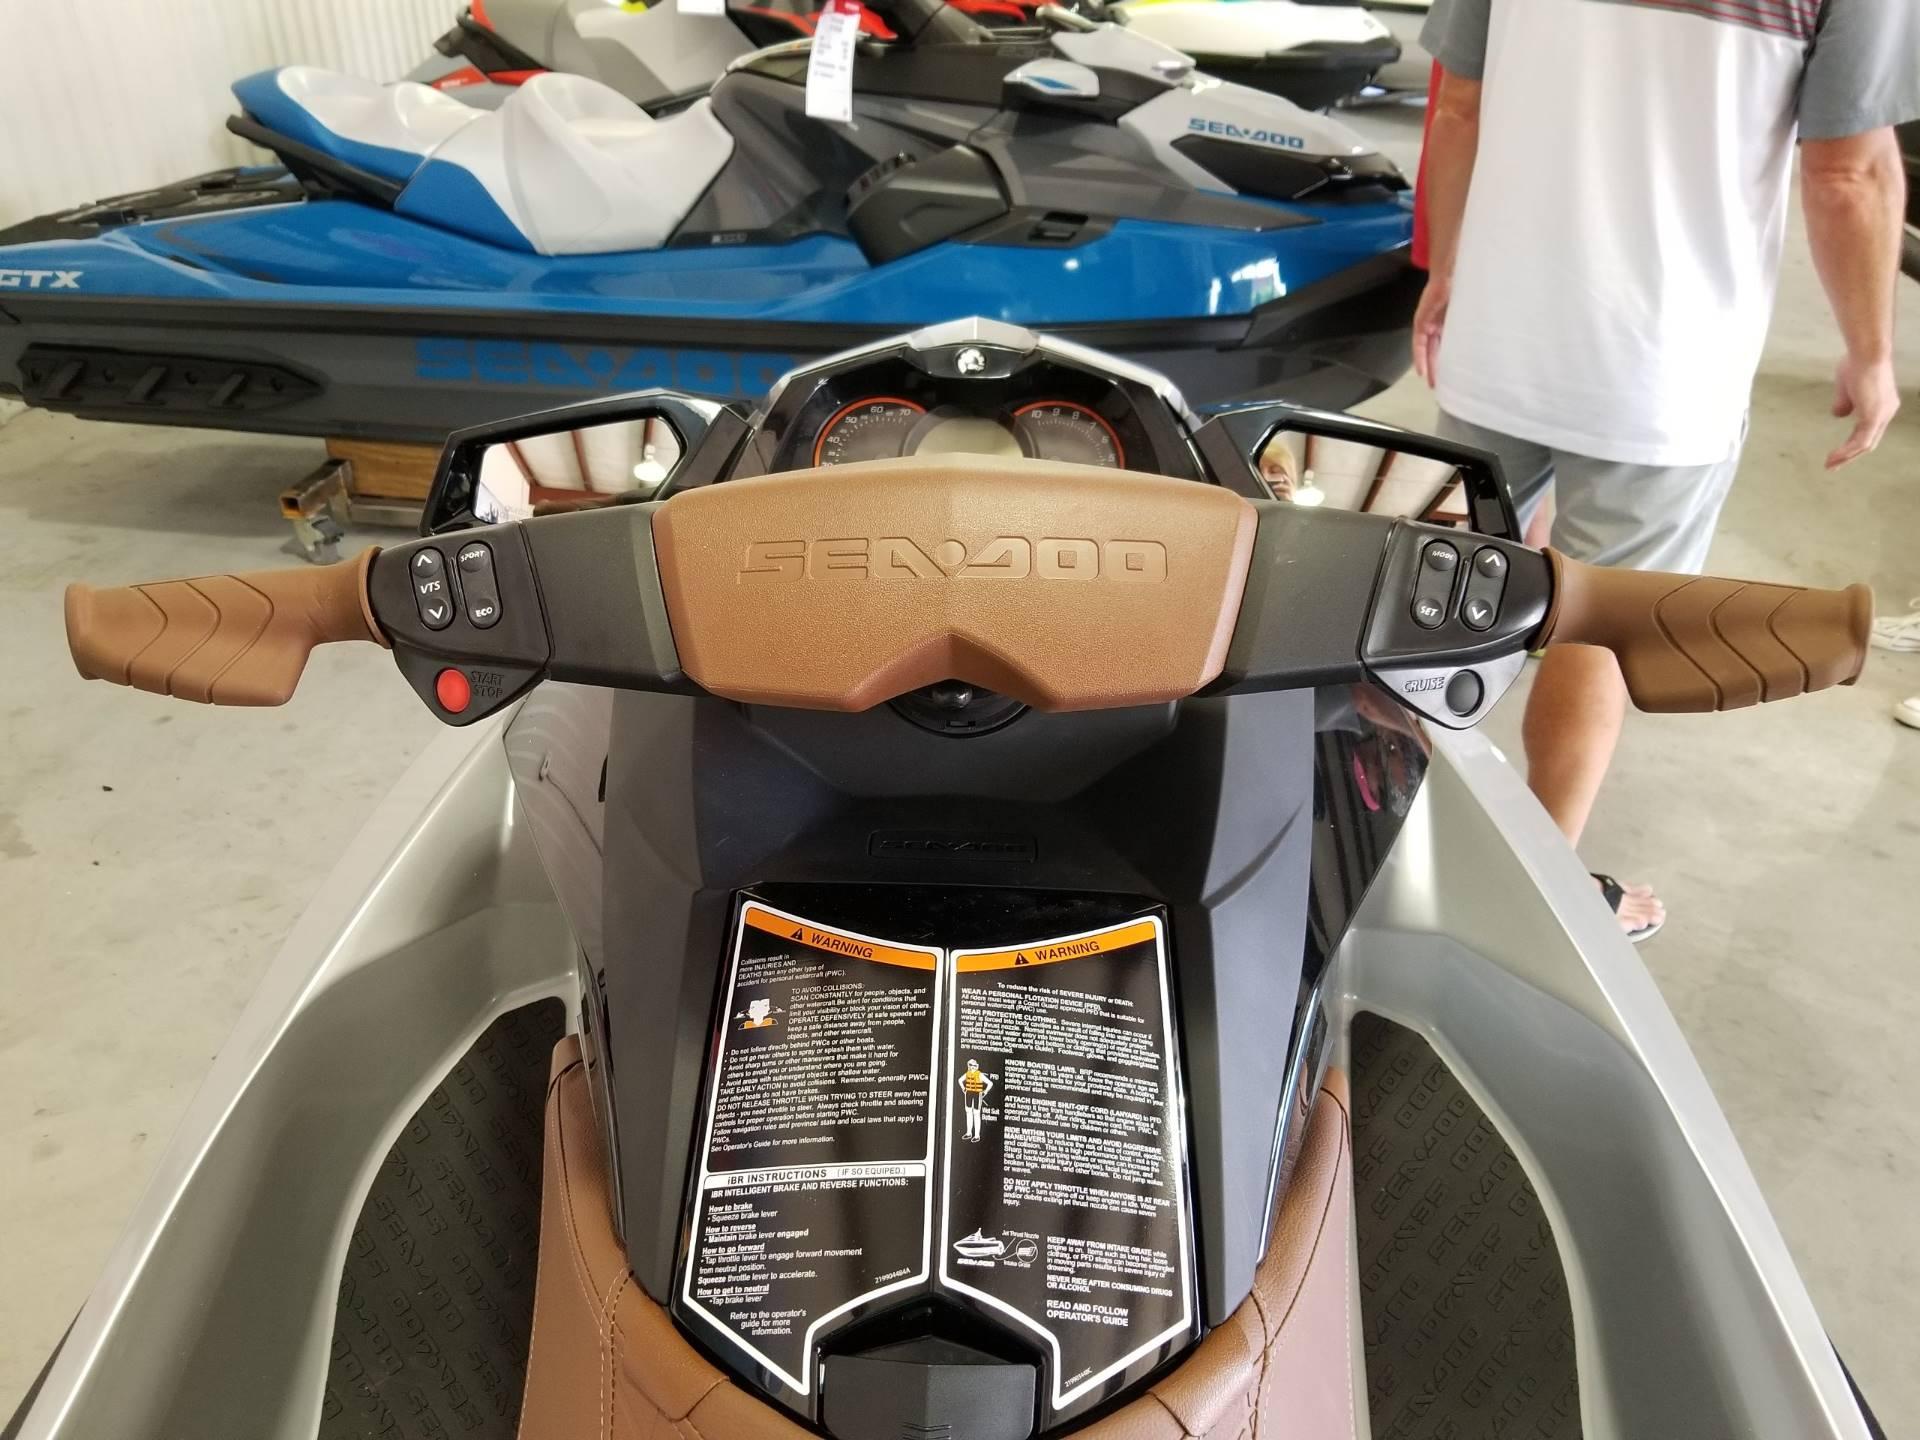 2018 Sea-Doo GTI Limited 155 11